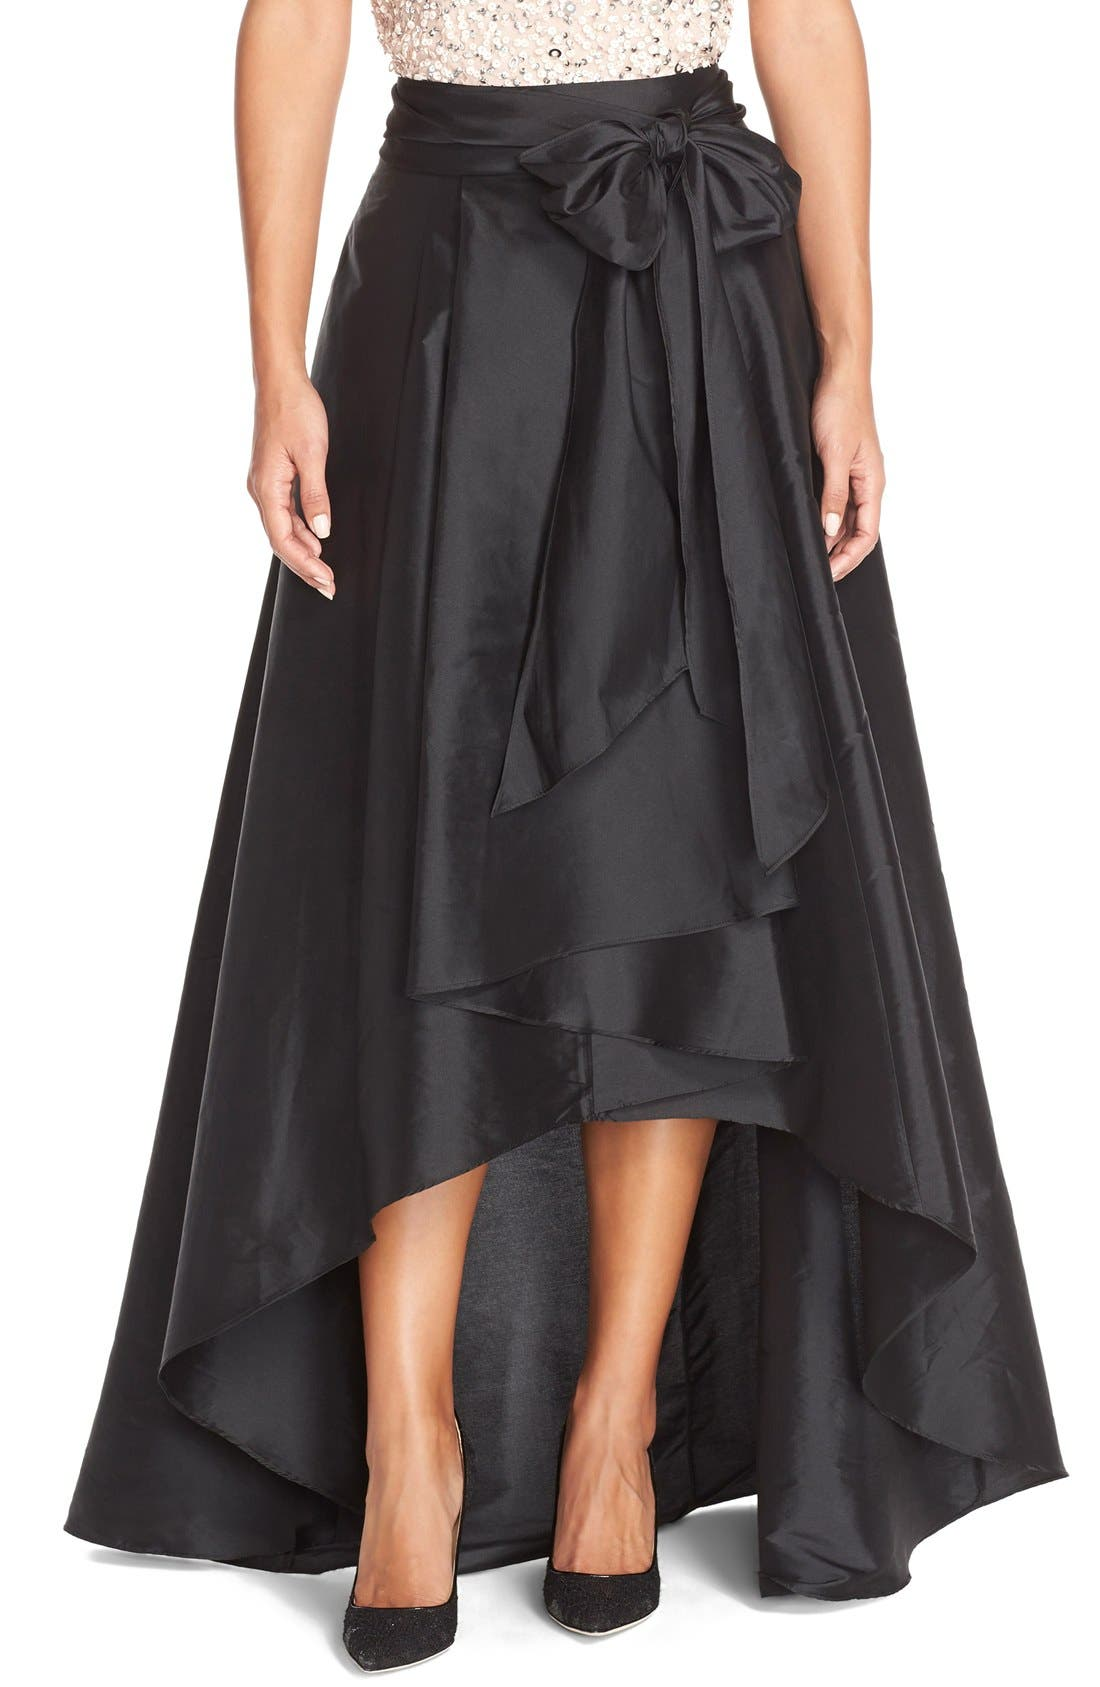 ADRIANNA PAPELL High/Low Taffeta Ball Skirt, Main, color, 001